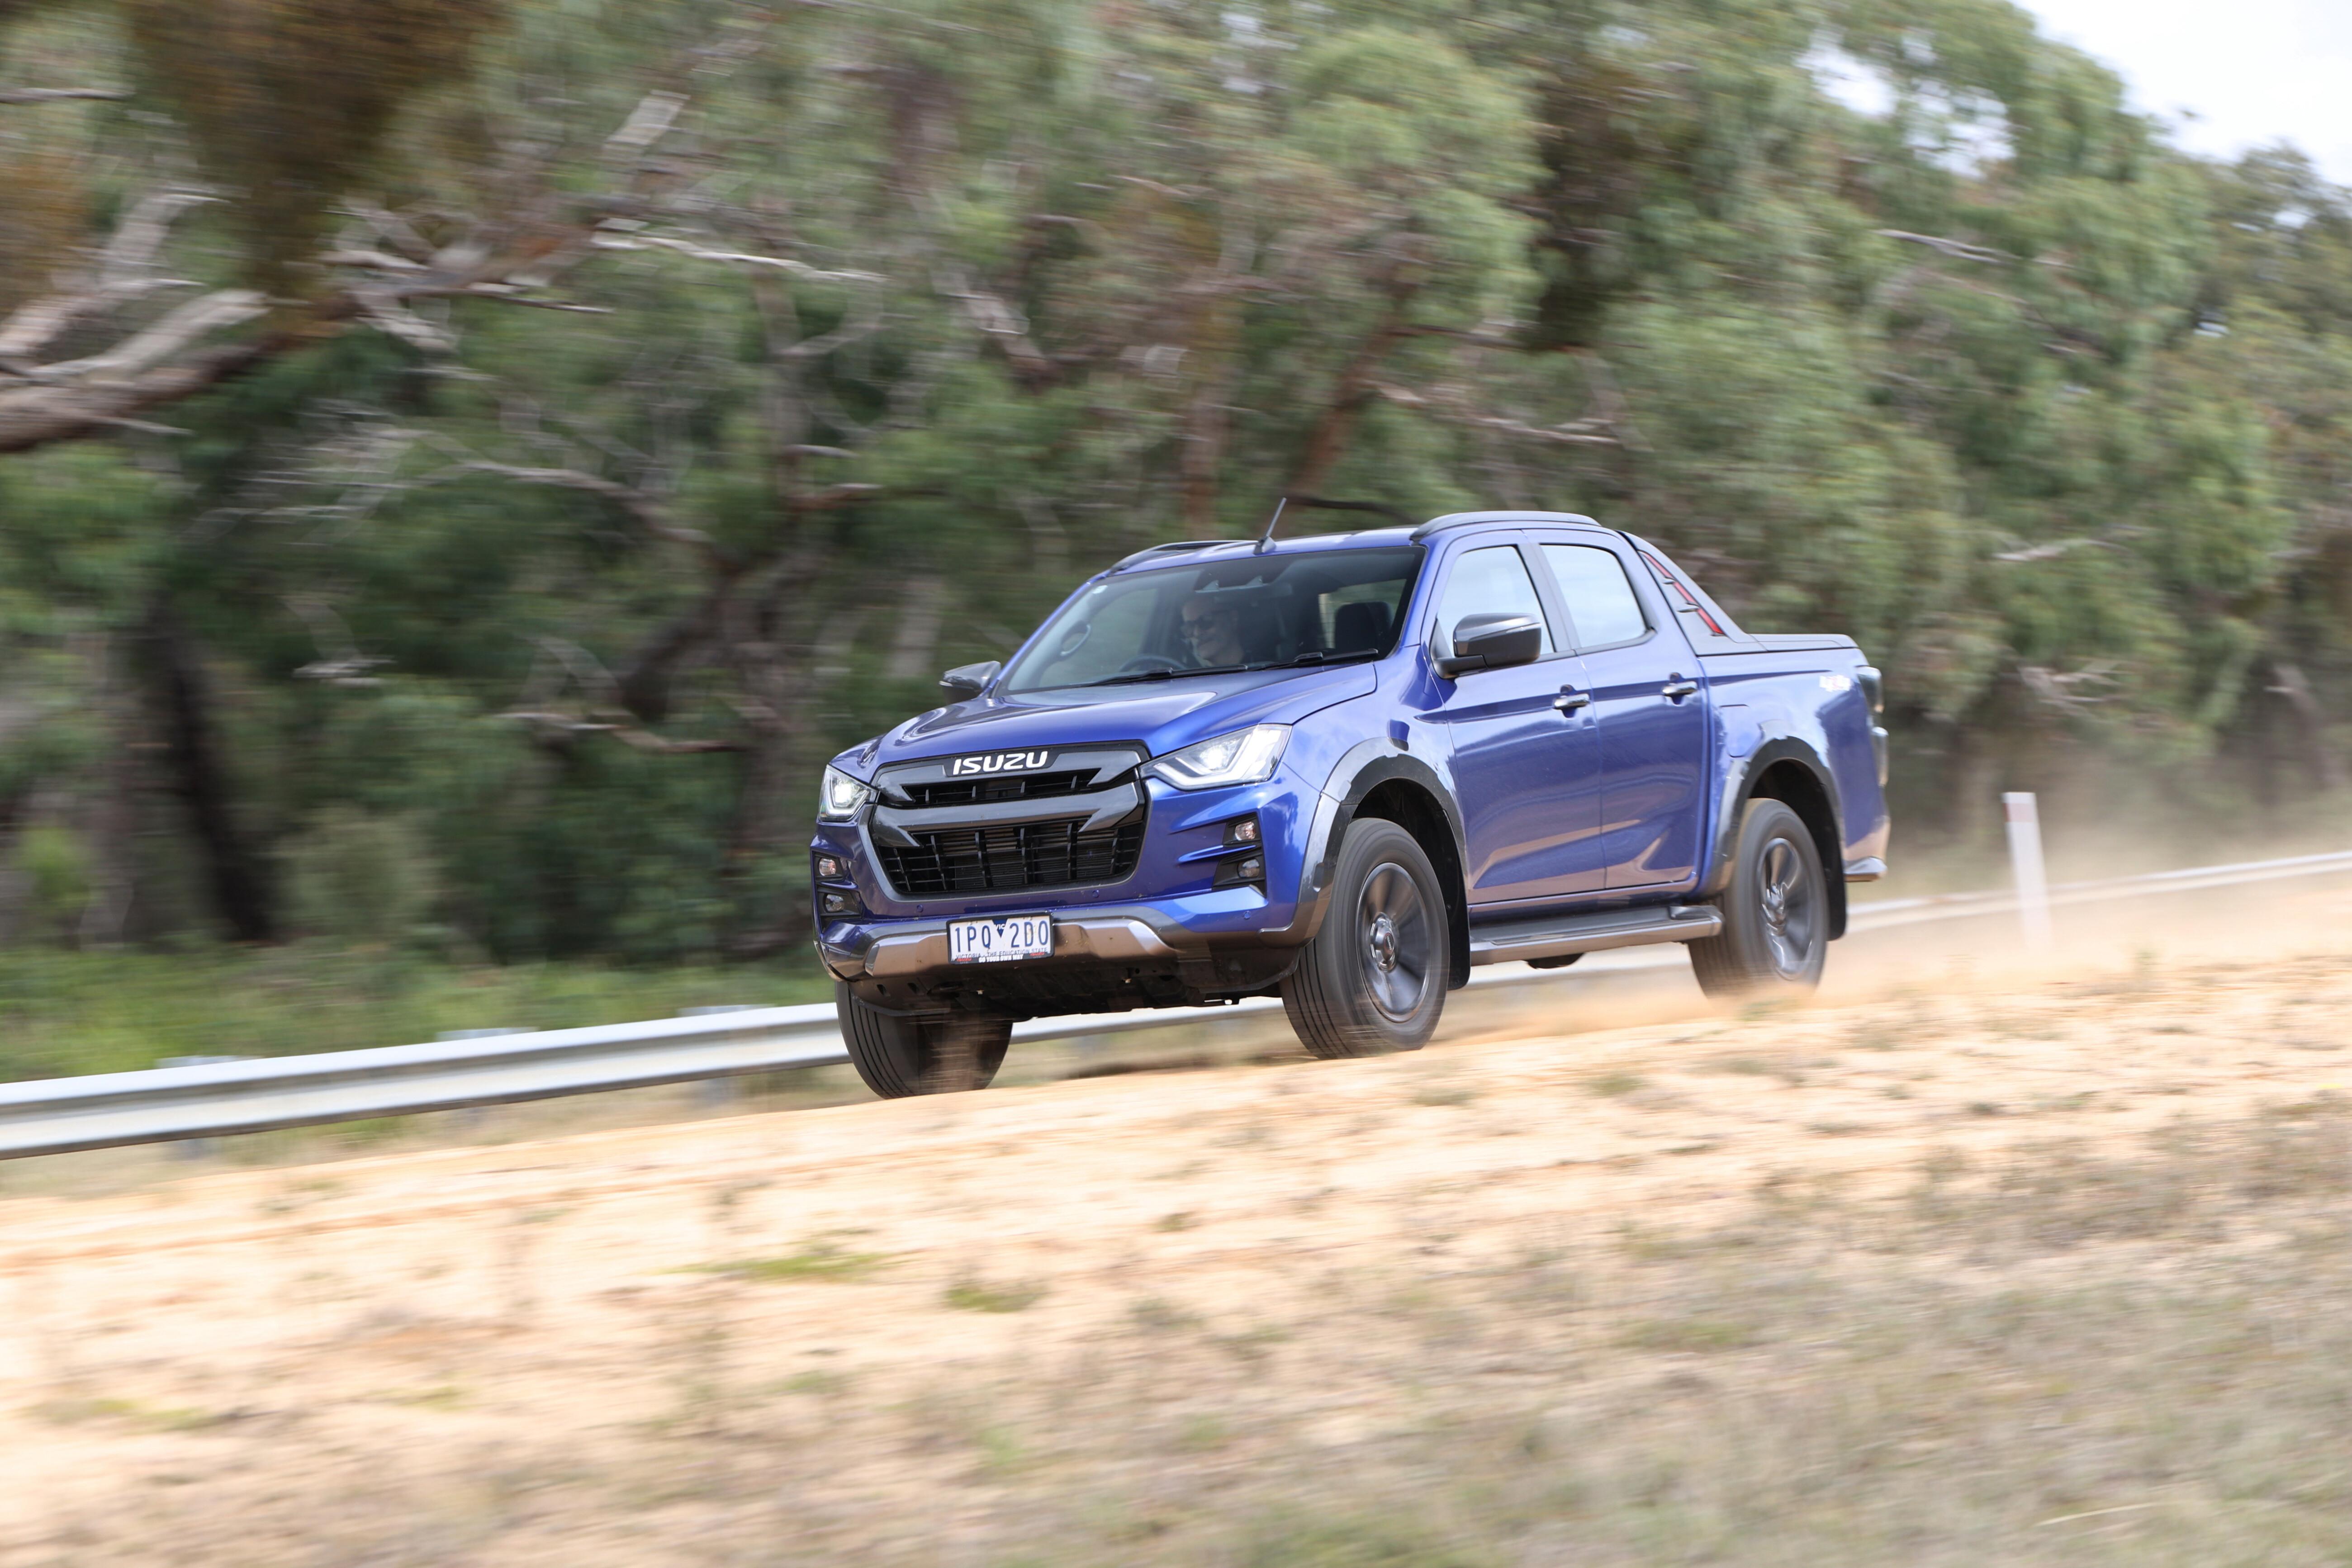 4 X 4 Australia Comparisons 2021 May 21 Isuzu D Max X Terrain Off Road Drive Review